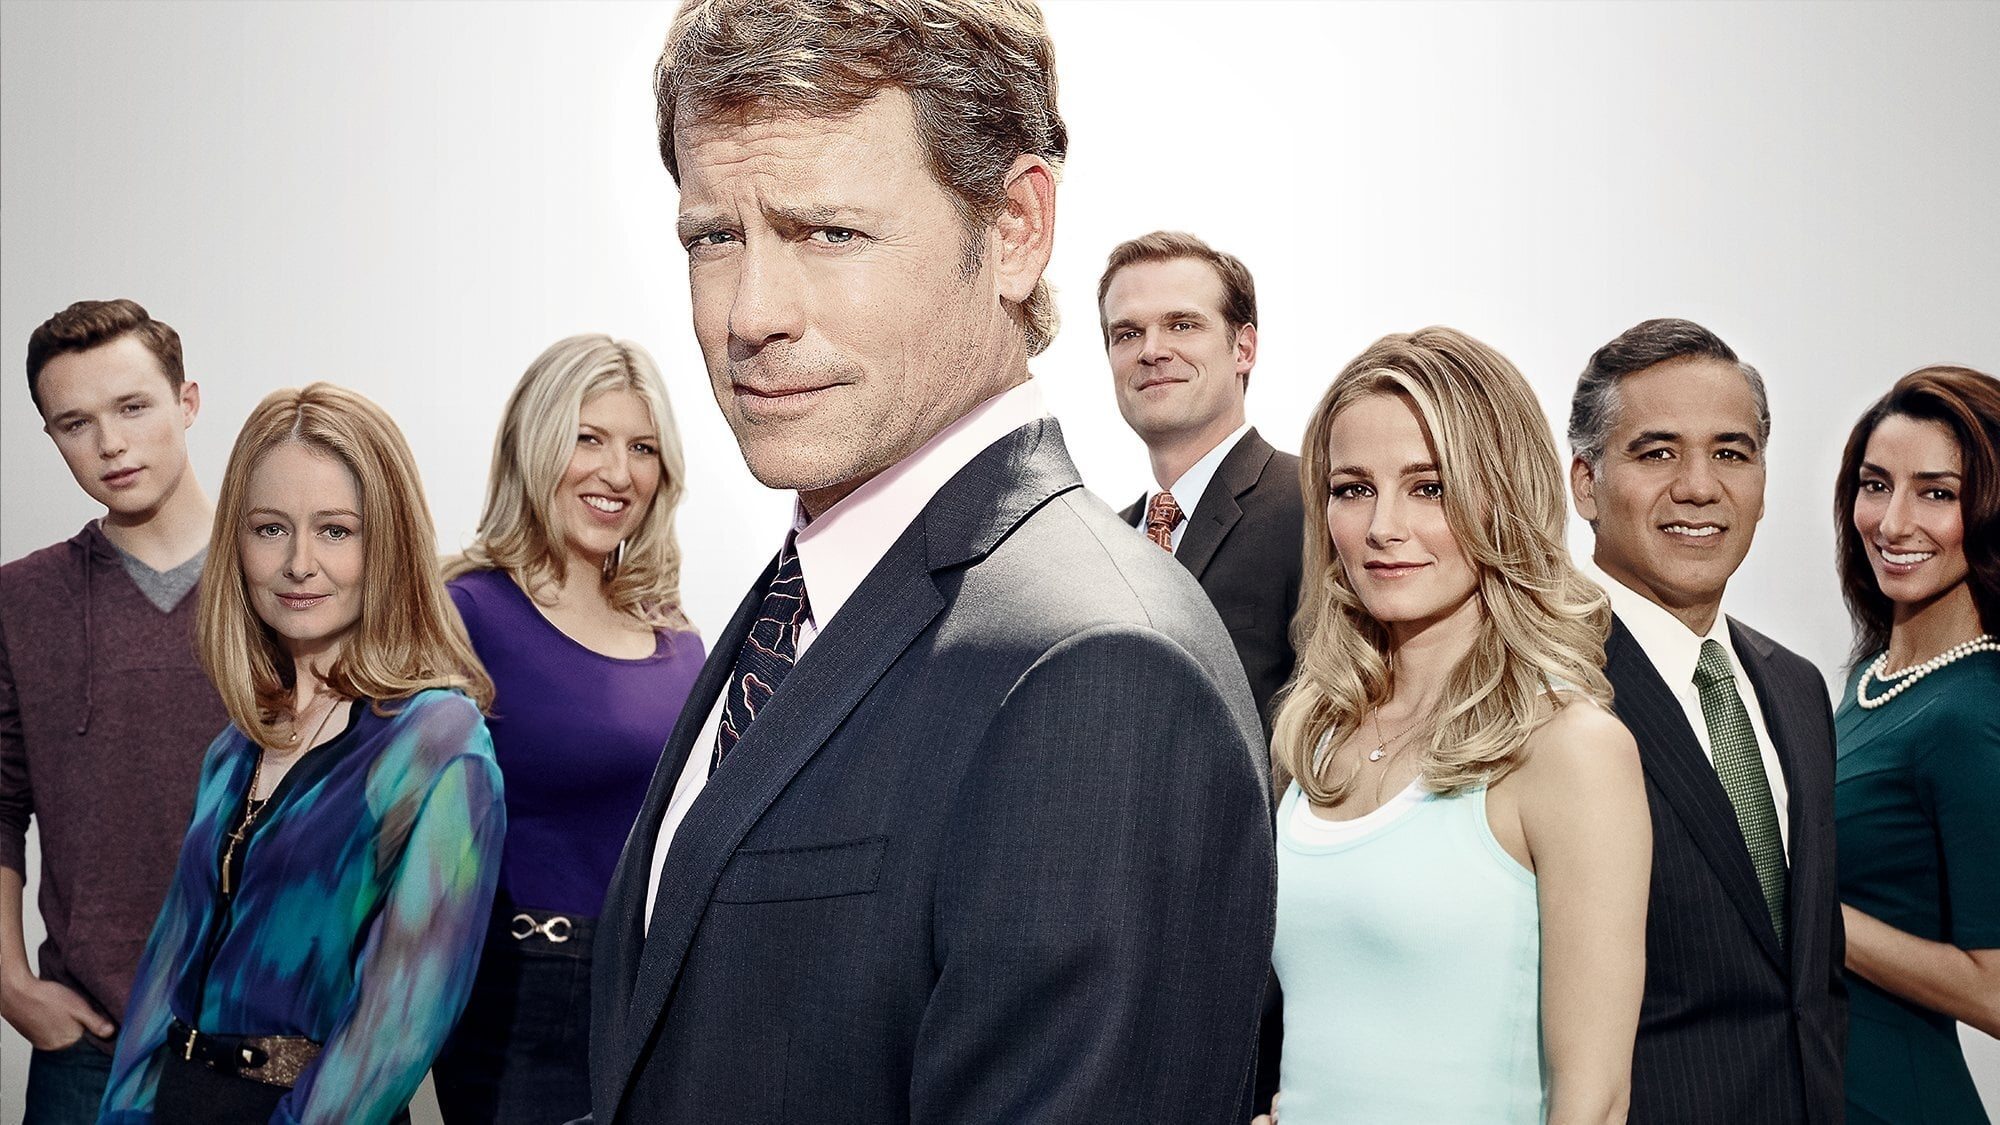 Greg Kinnear hoofdrol in nieuw drama 'Rake' van FOX